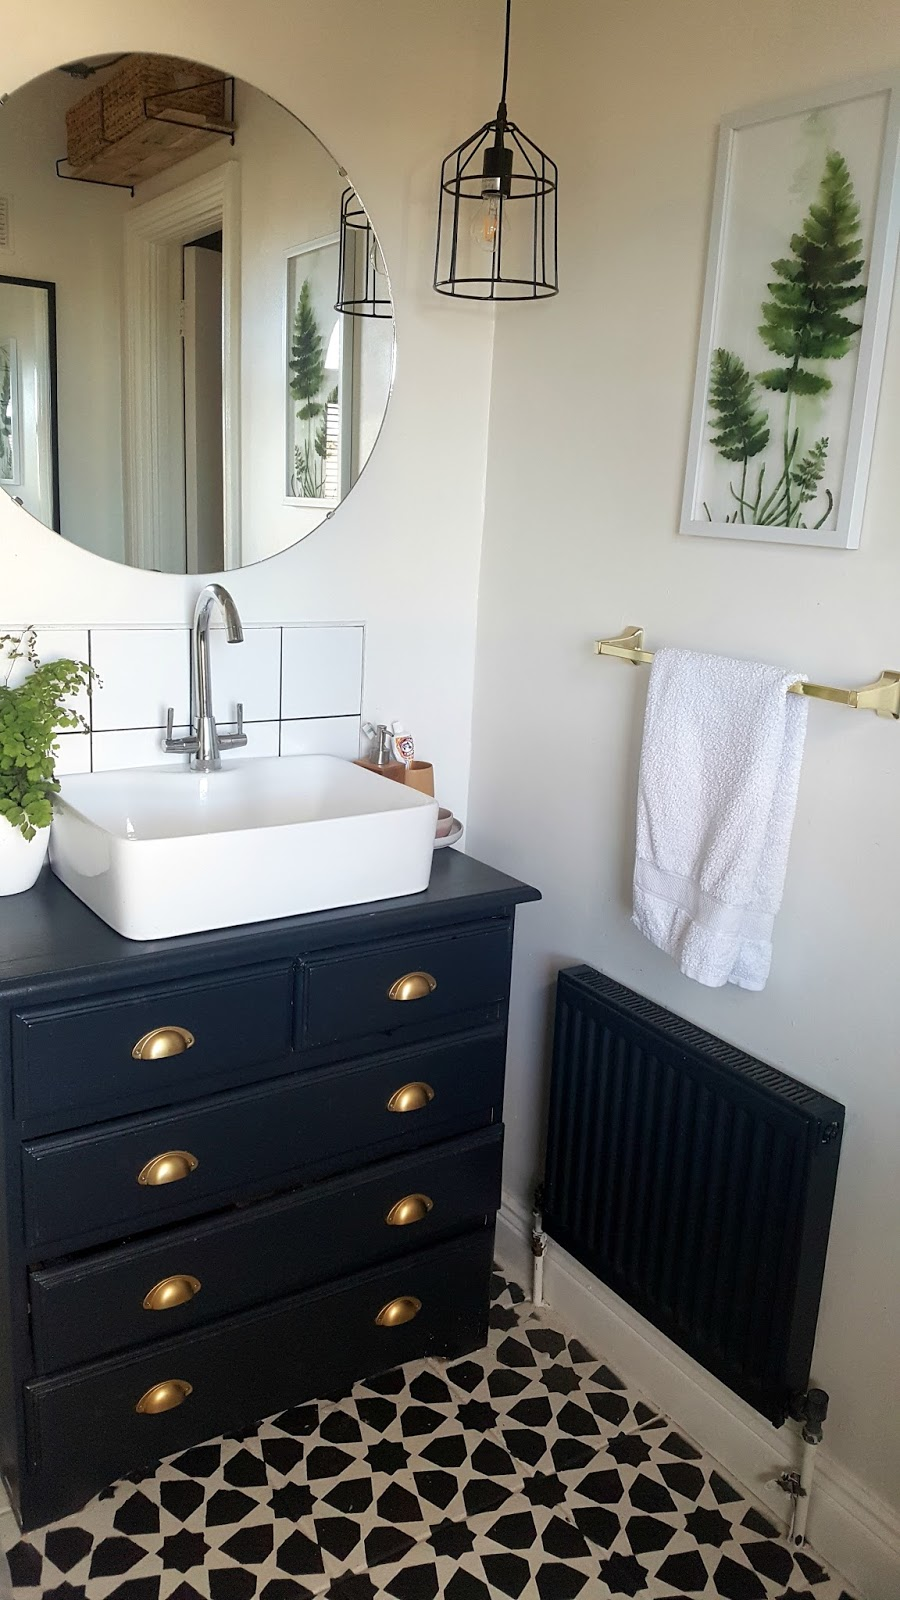 Industrial Glam Bathroom Reveal Finally Make Do And Diy